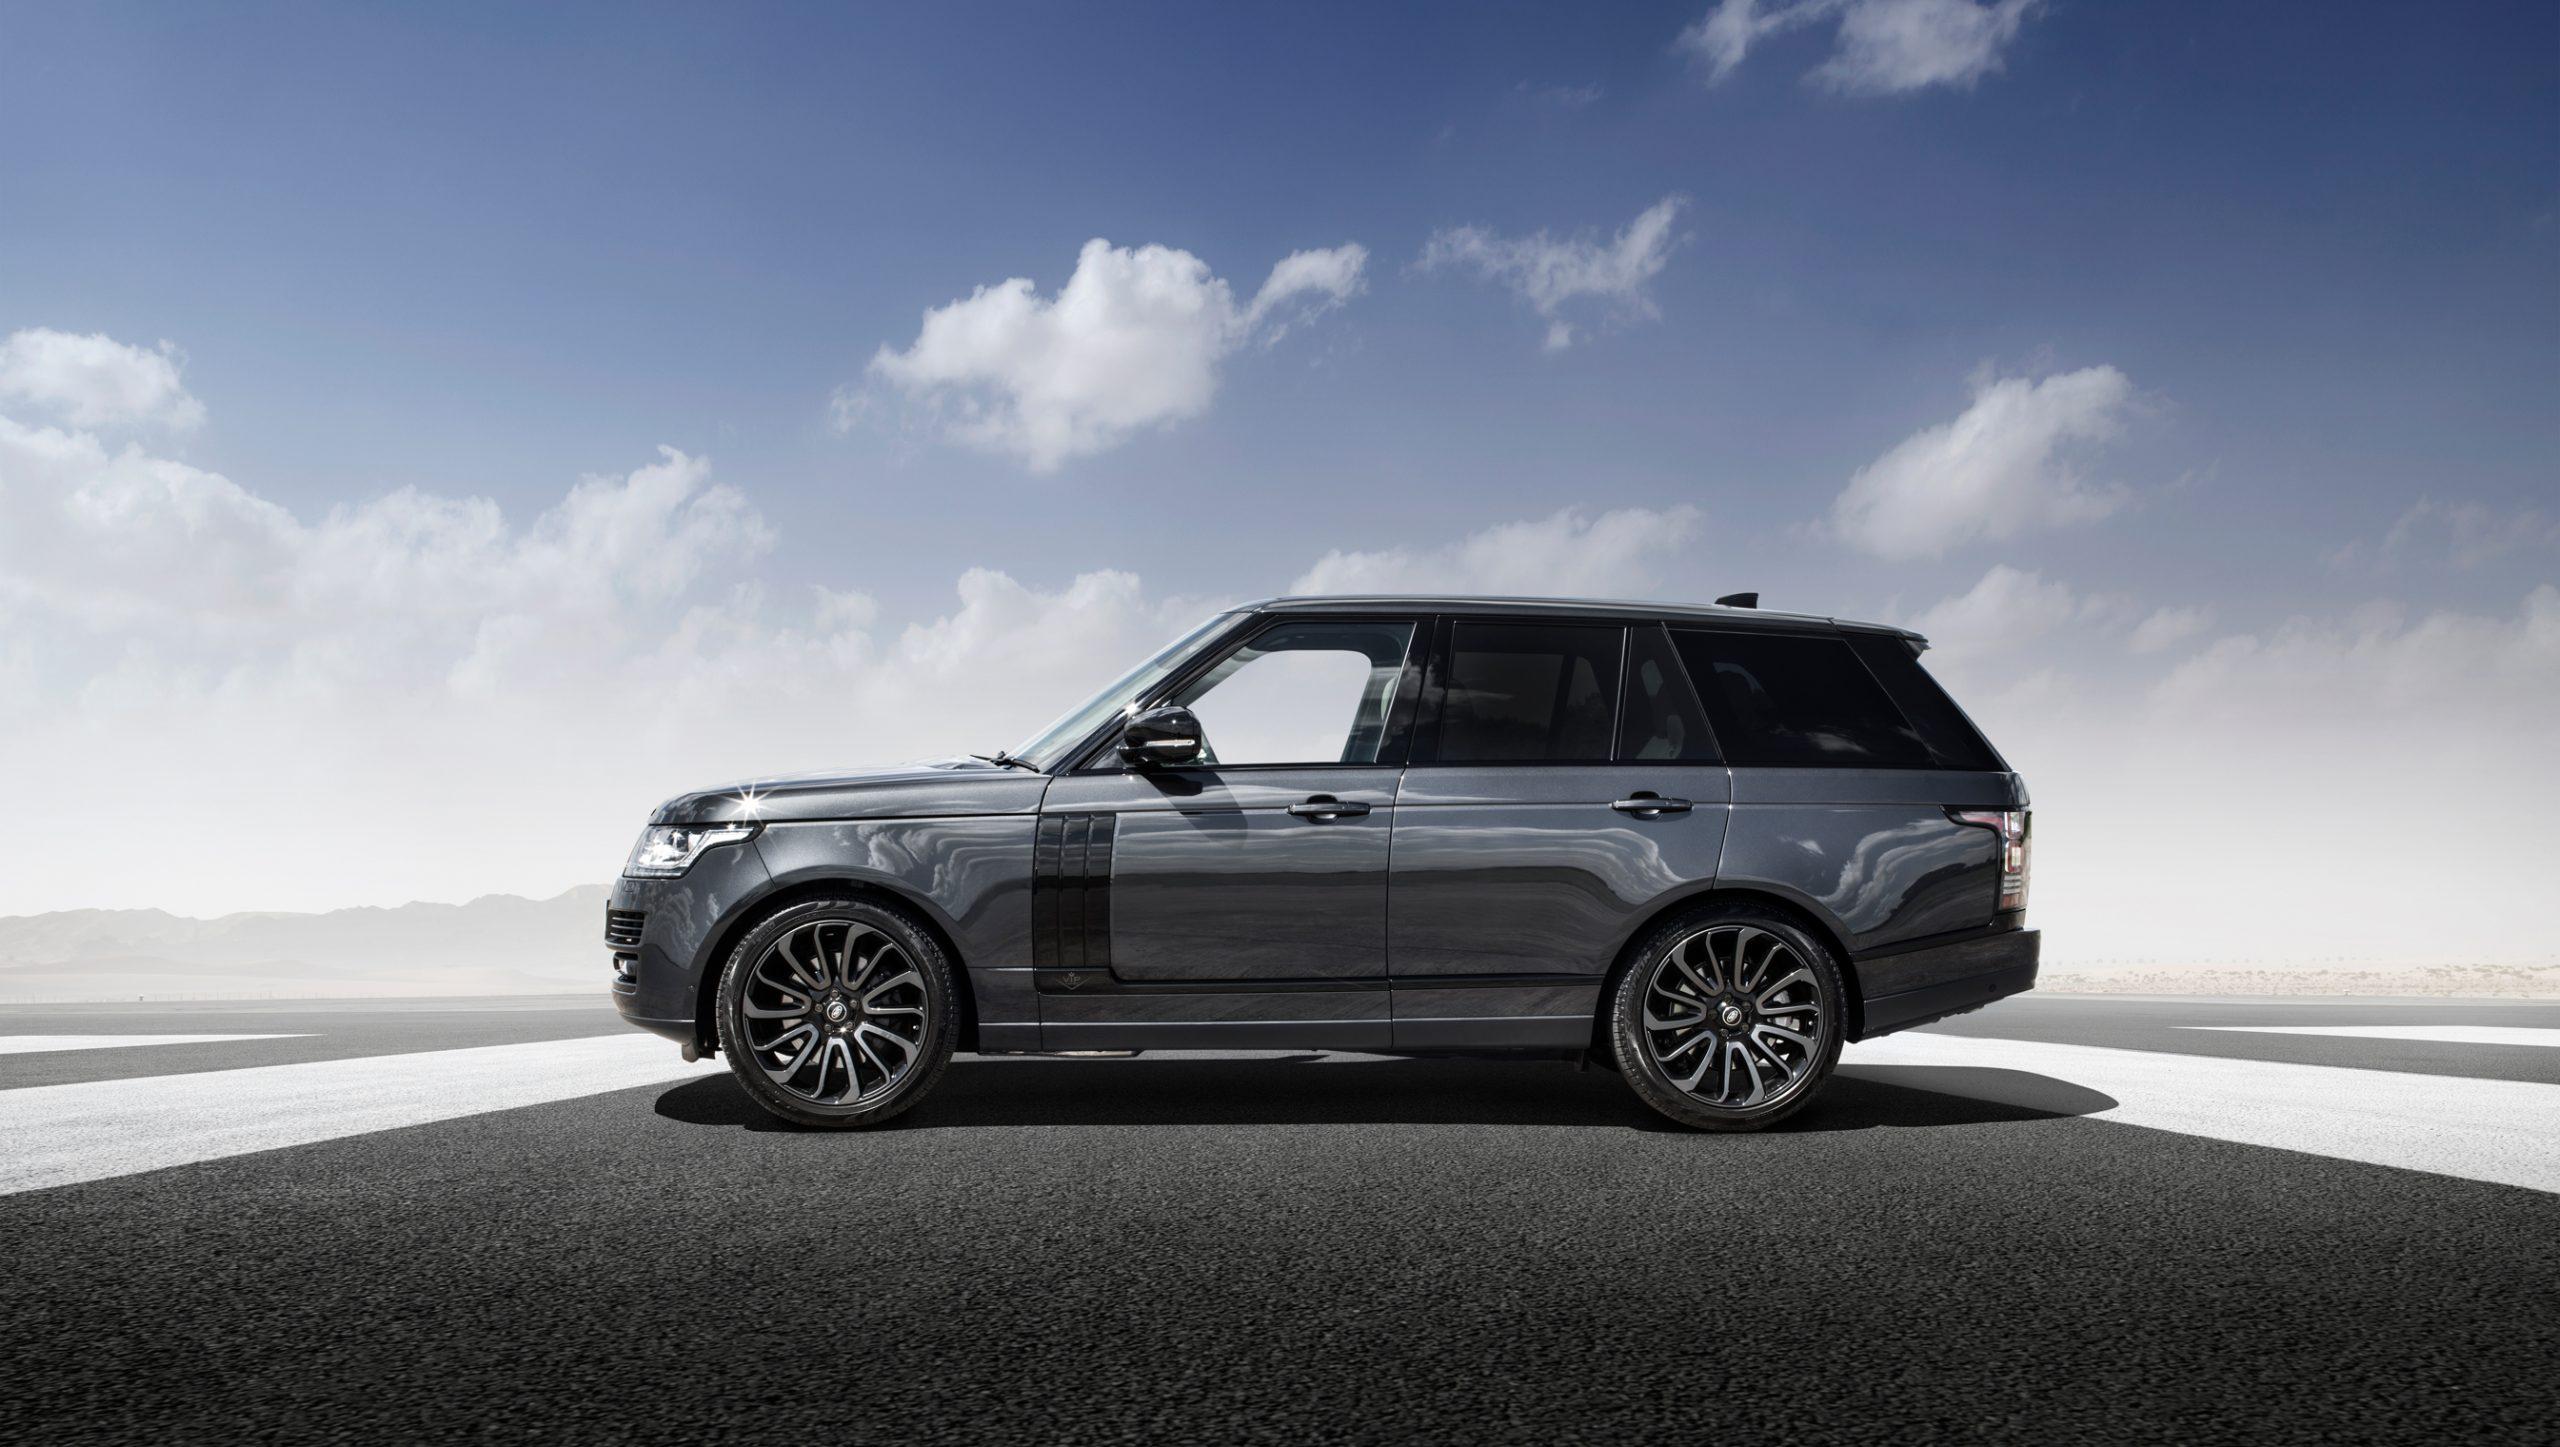 VIP Design Club Range Rover Autobiography Stealth Tuning 650bhp